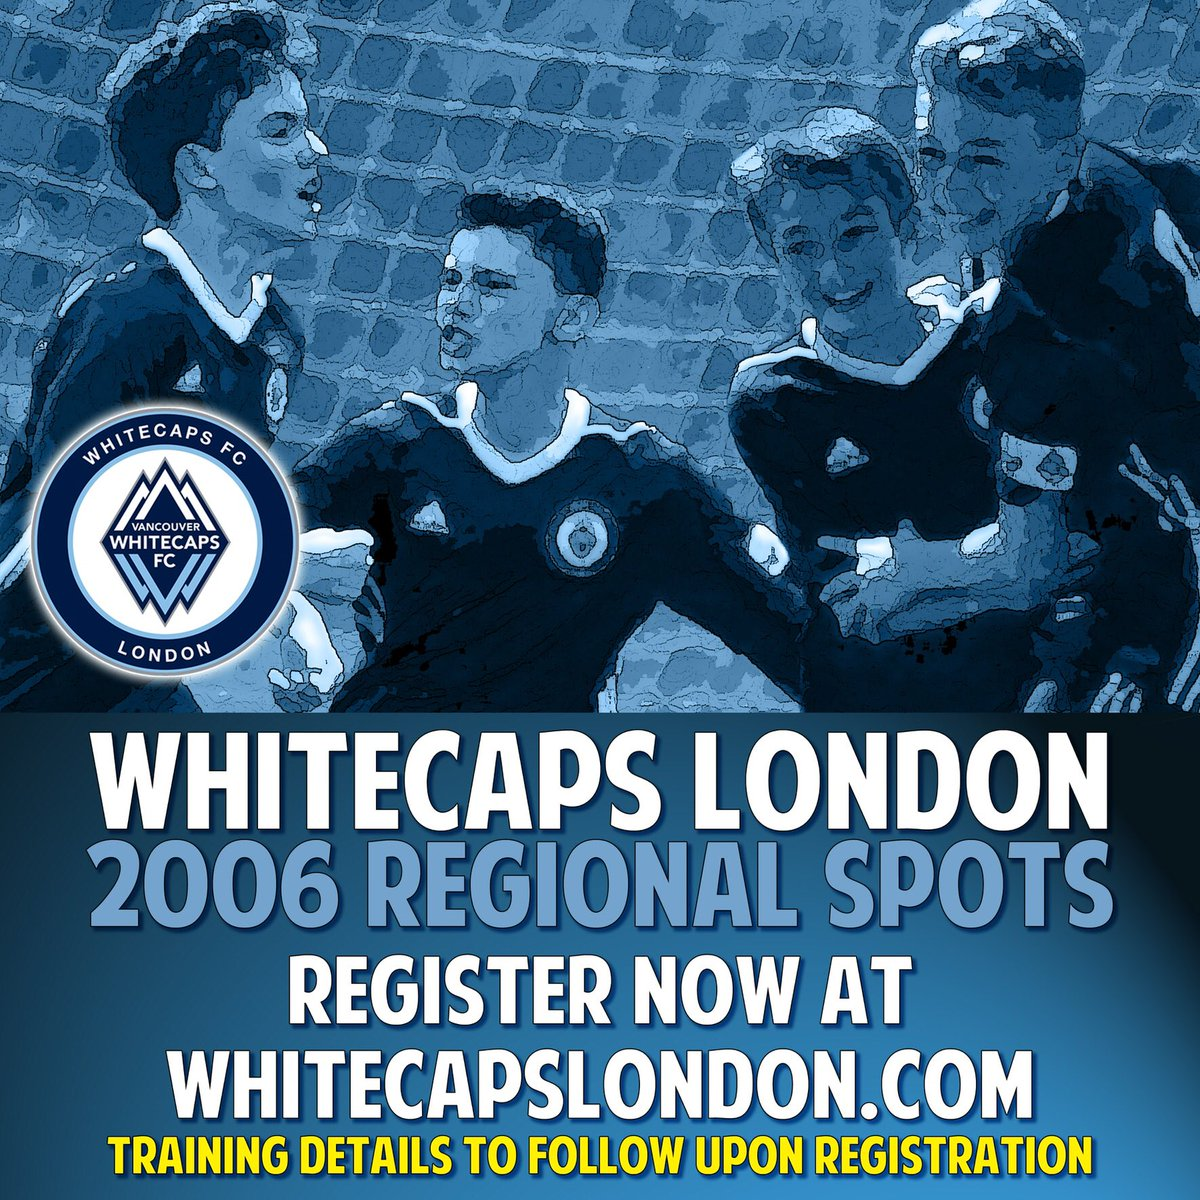 Whitecaps London - 2006 Regional Boys and Girls   ⬇️⬇️⬇️ Link for details ⬇️⬇️⬇️  http://whitecapslondon.teampages.com   #whitecapslondon #lndont @londonwhitecaps #ontariosoccer #playerdevelopment